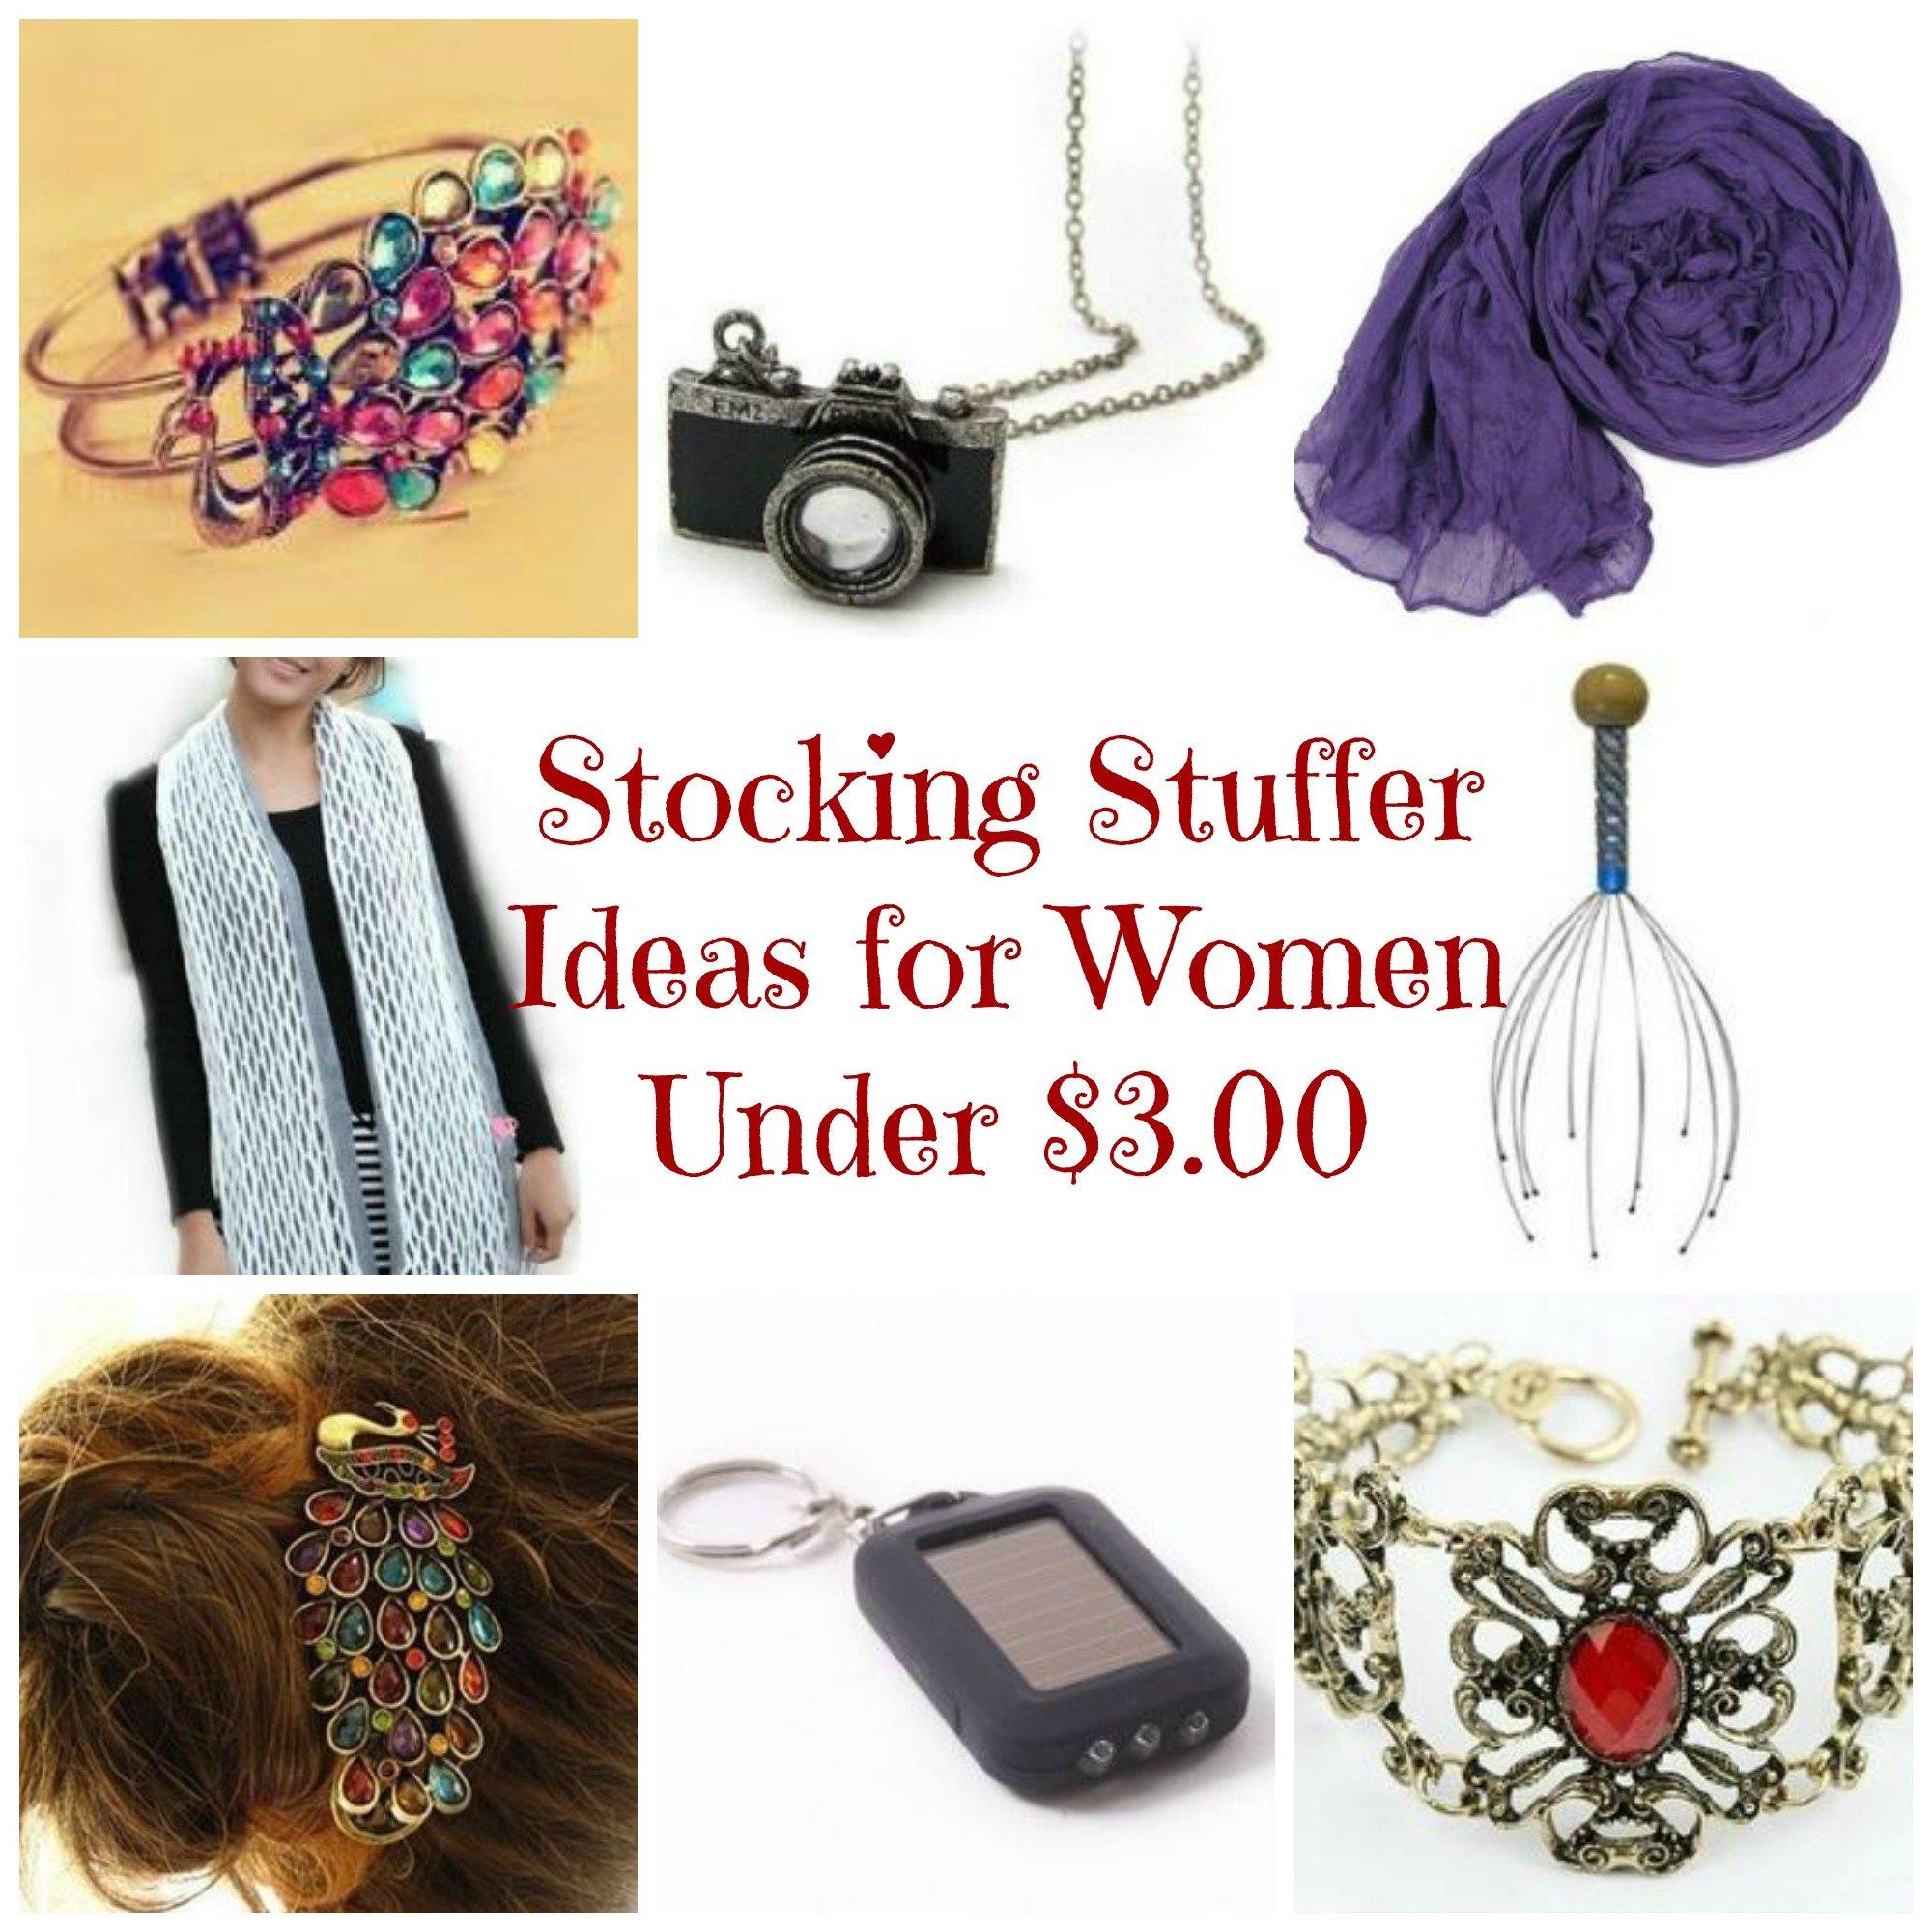 Stocking Stuffer Ideas for Women under $3.00 SHIPPED